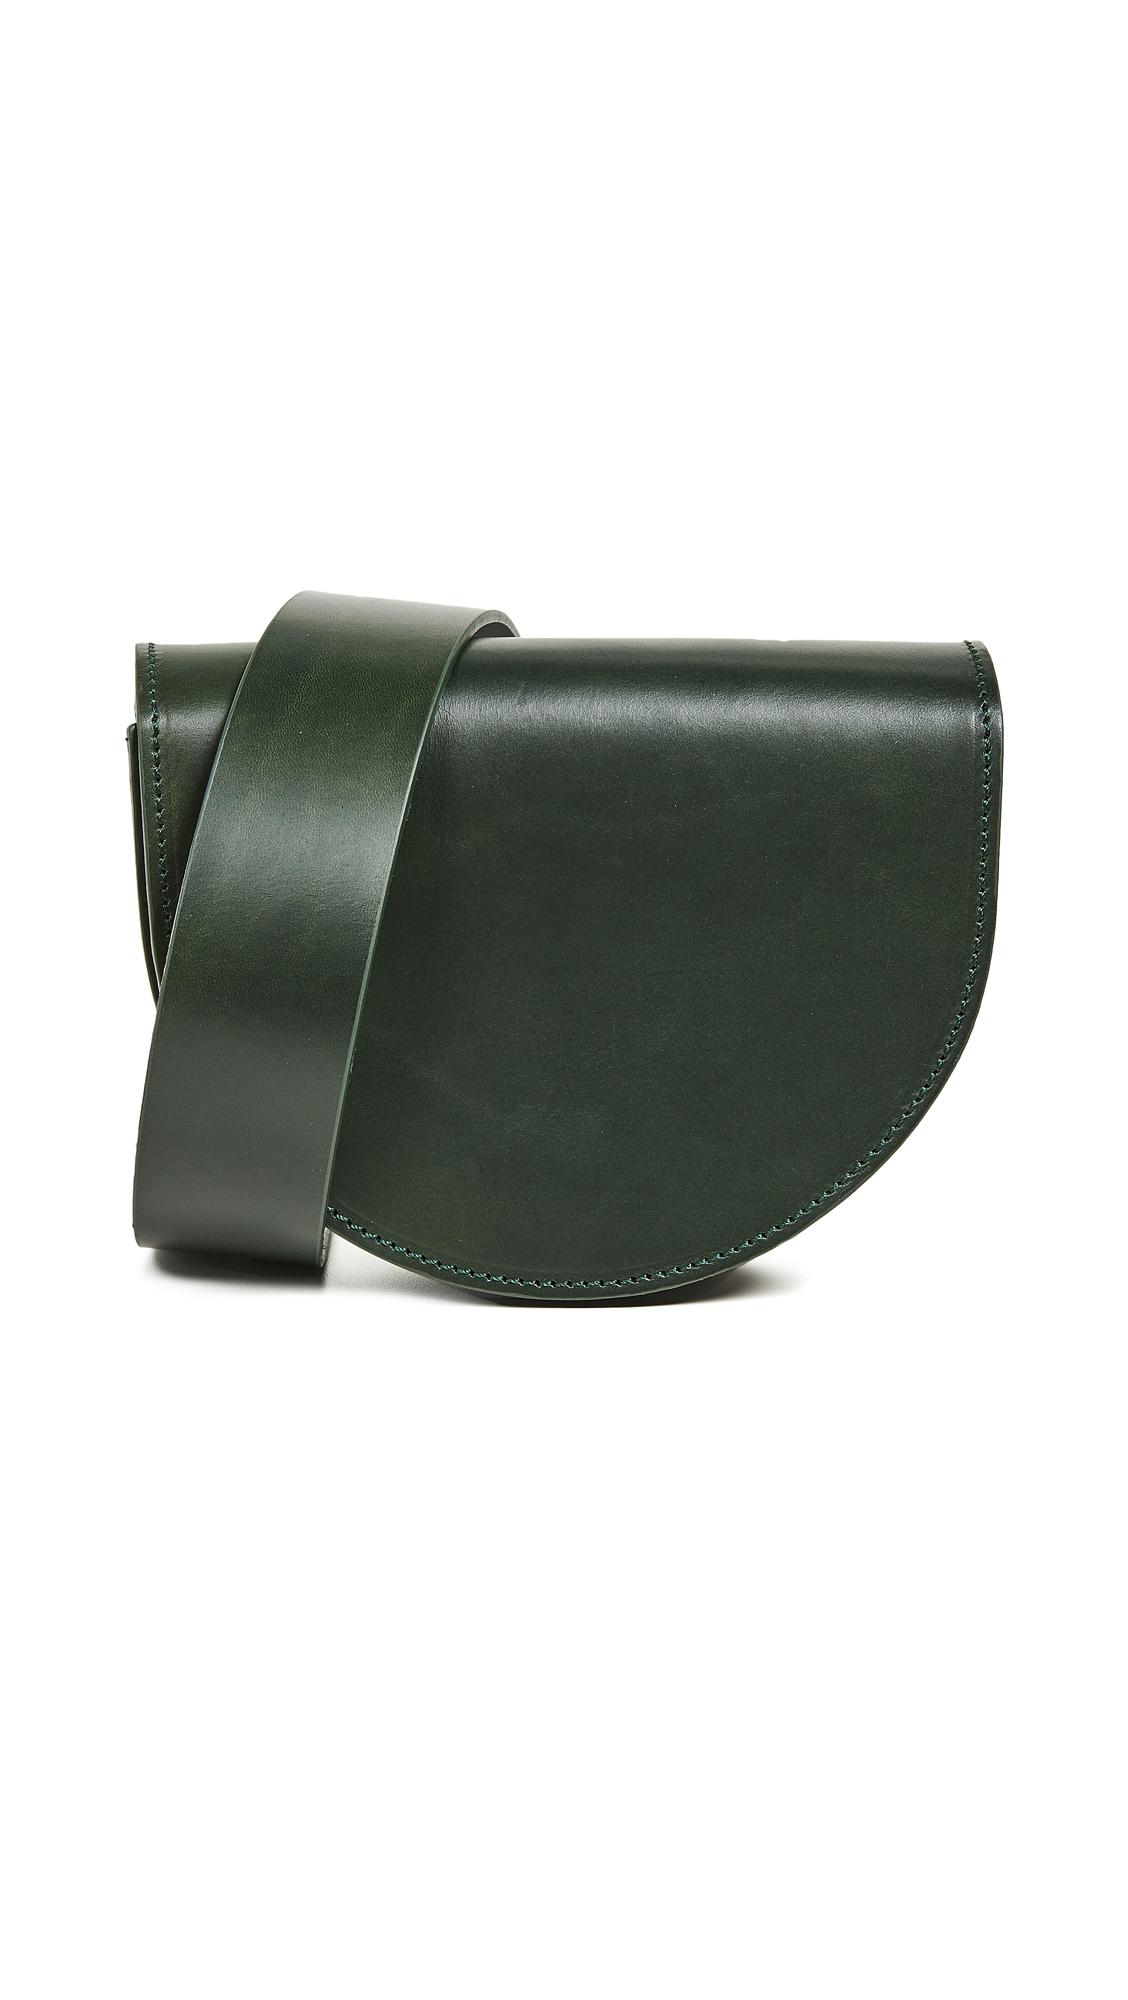 VEREVERTO Luna Belt Bag in Green